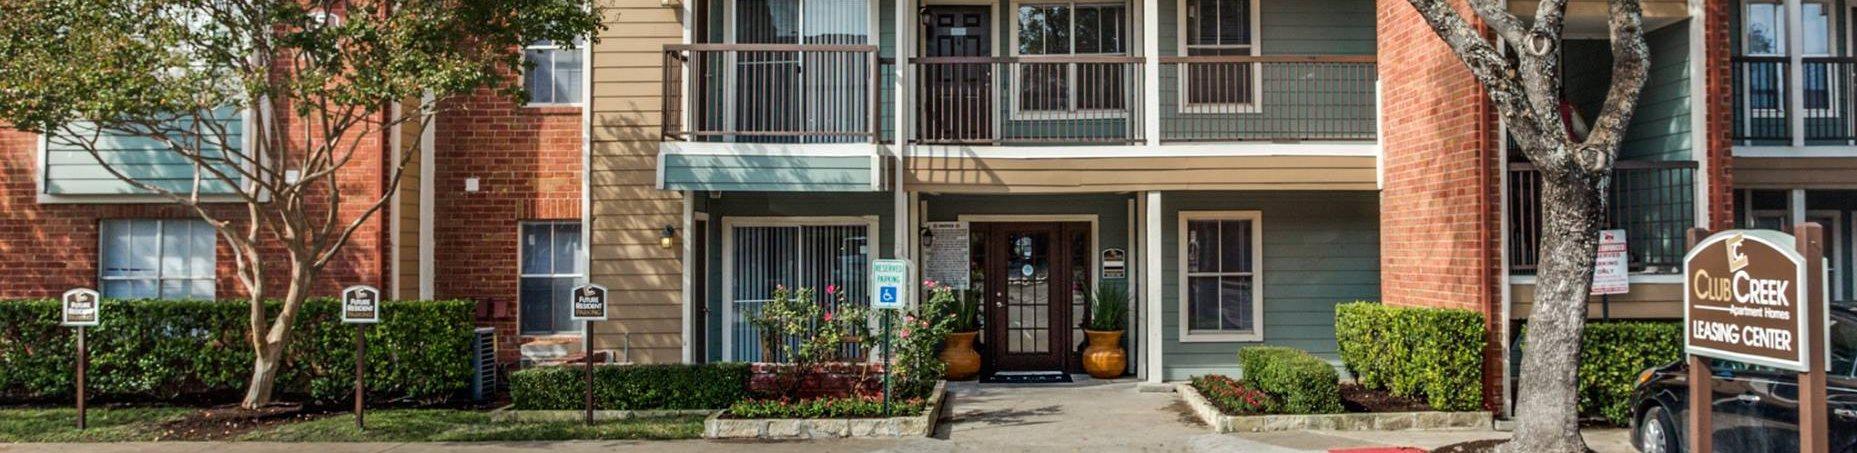 Club Creek Apartments Austin